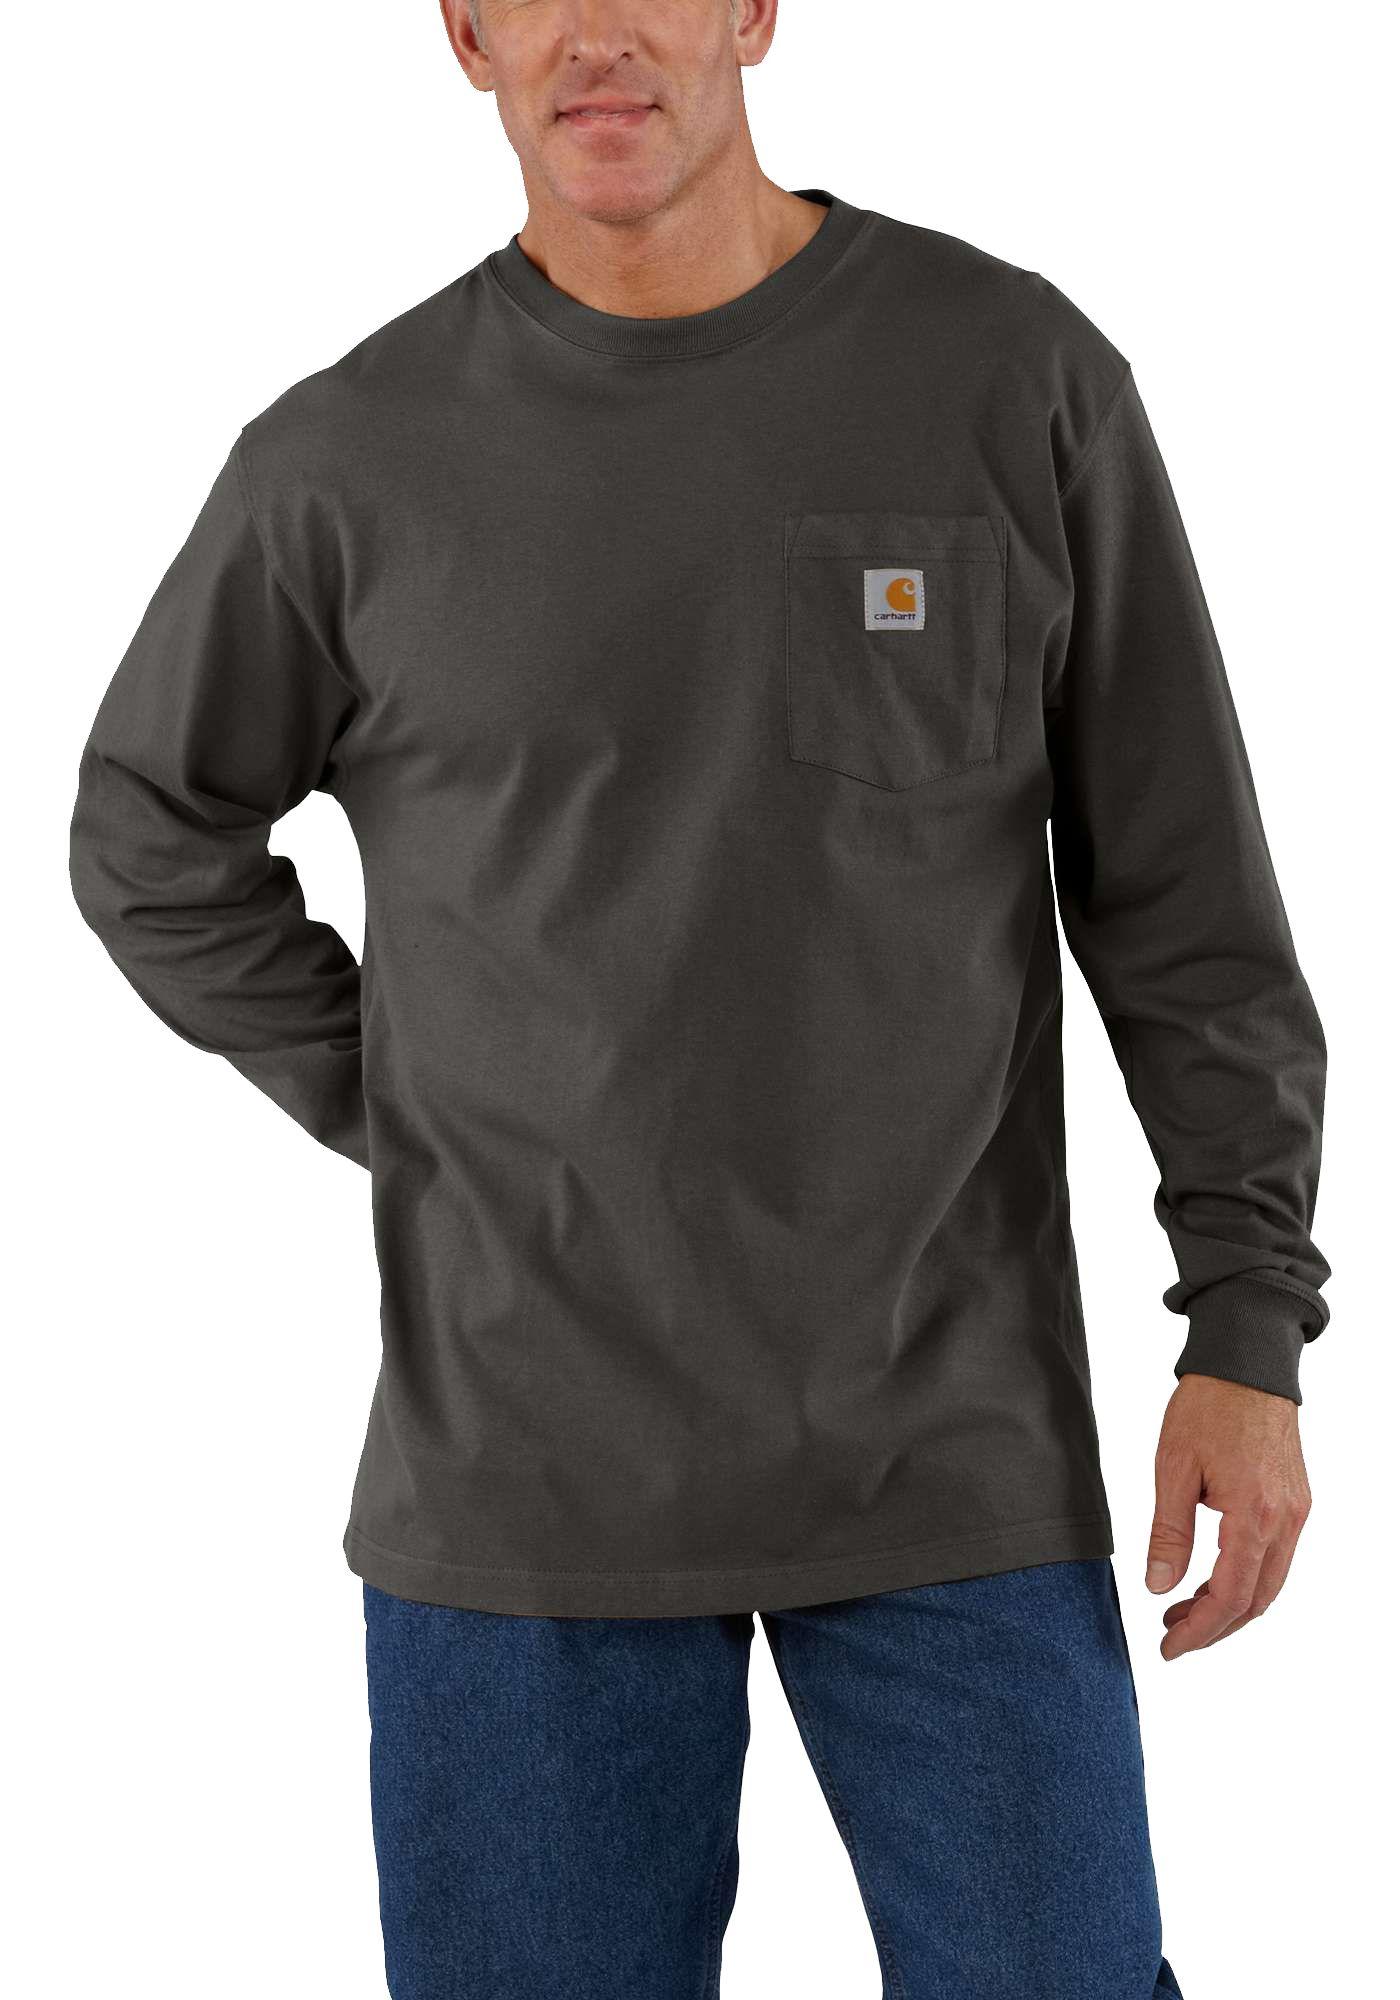 Carhartt Men's Workwear Long Sleeve Pocket T-Shirt